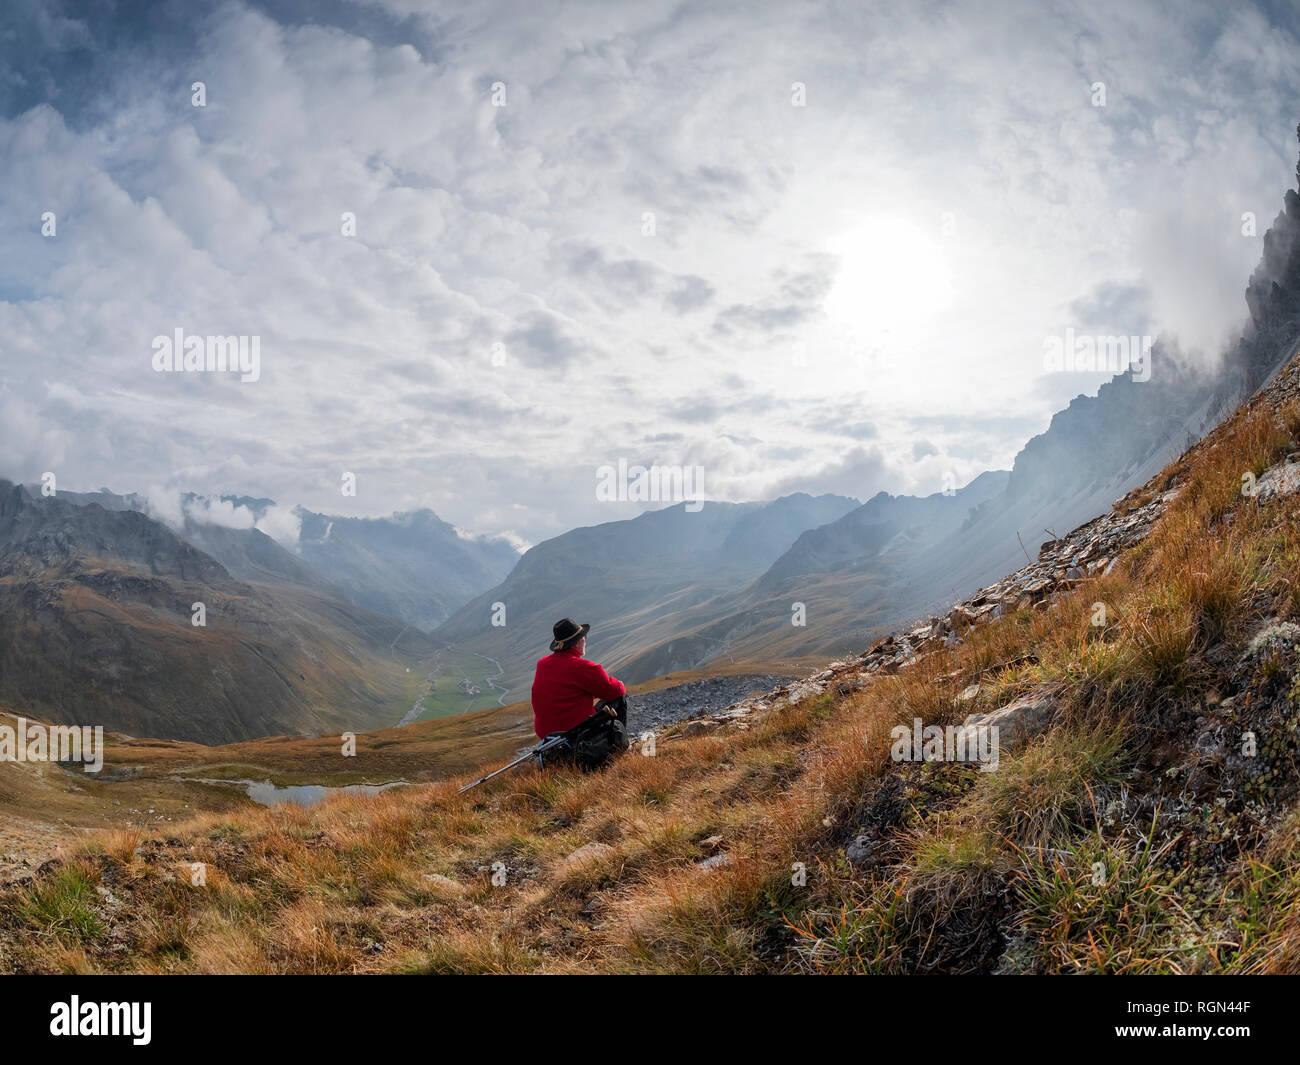 Border region Italy Switzerland, senior man having a break from hiking in mountain landscape at Piz Umbrail Stock Photo